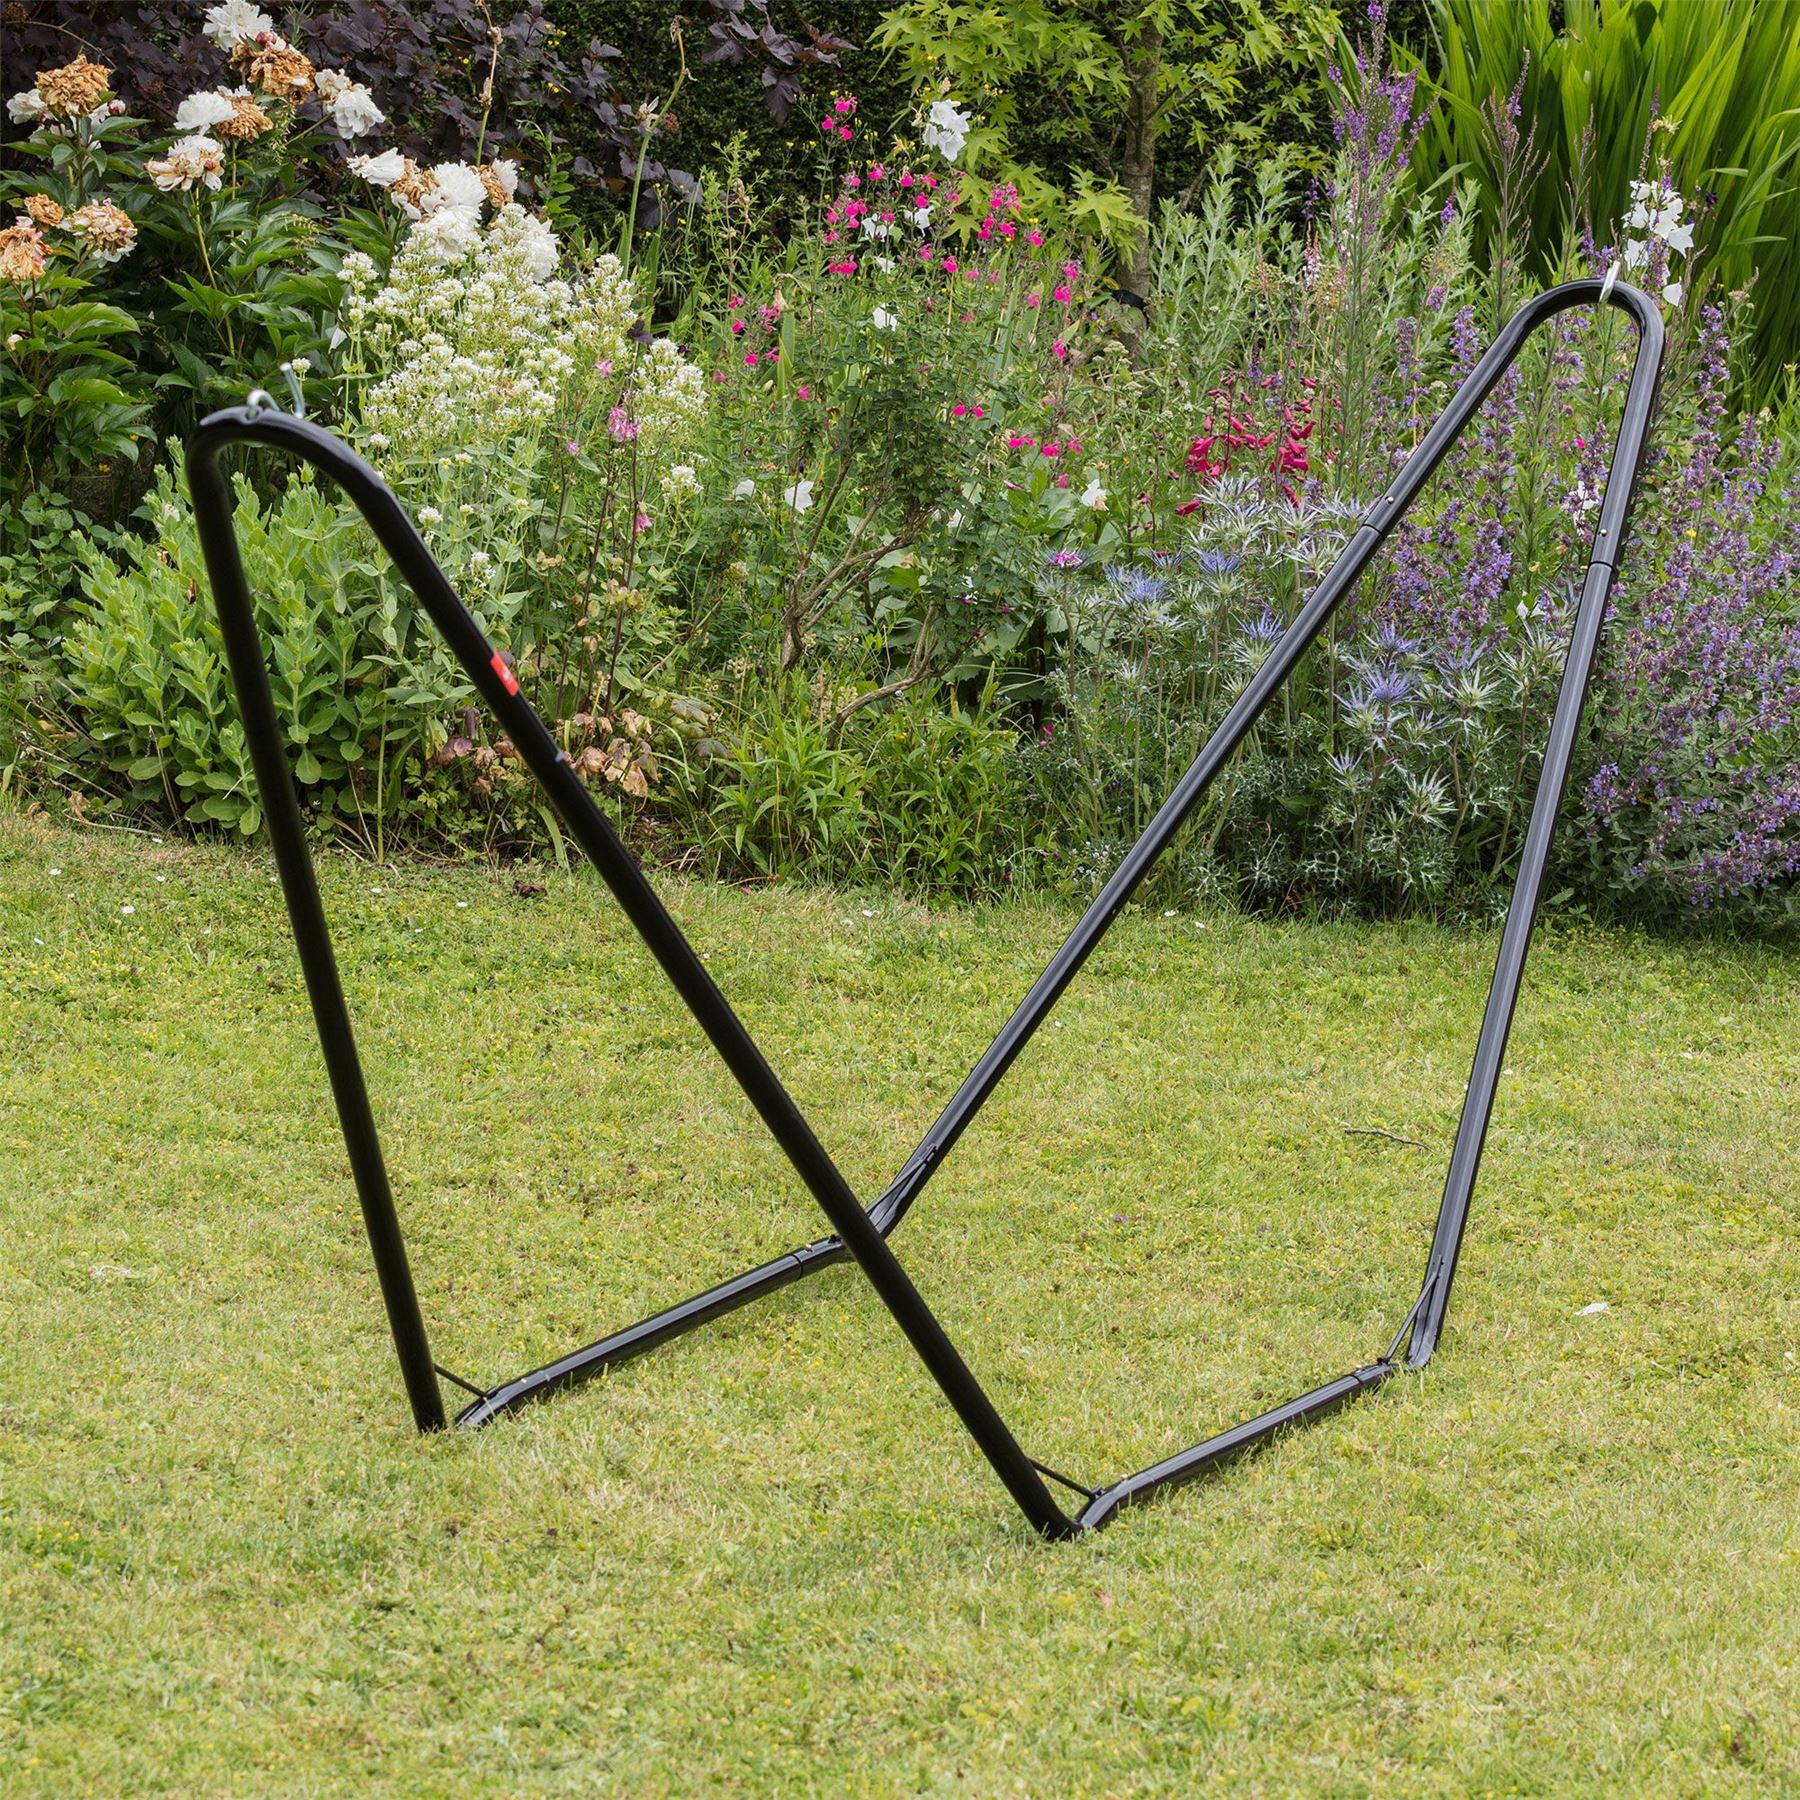 Garden Hammock Stand: Metal Hammock Stand Frame, Large Garden Camping Outdoor